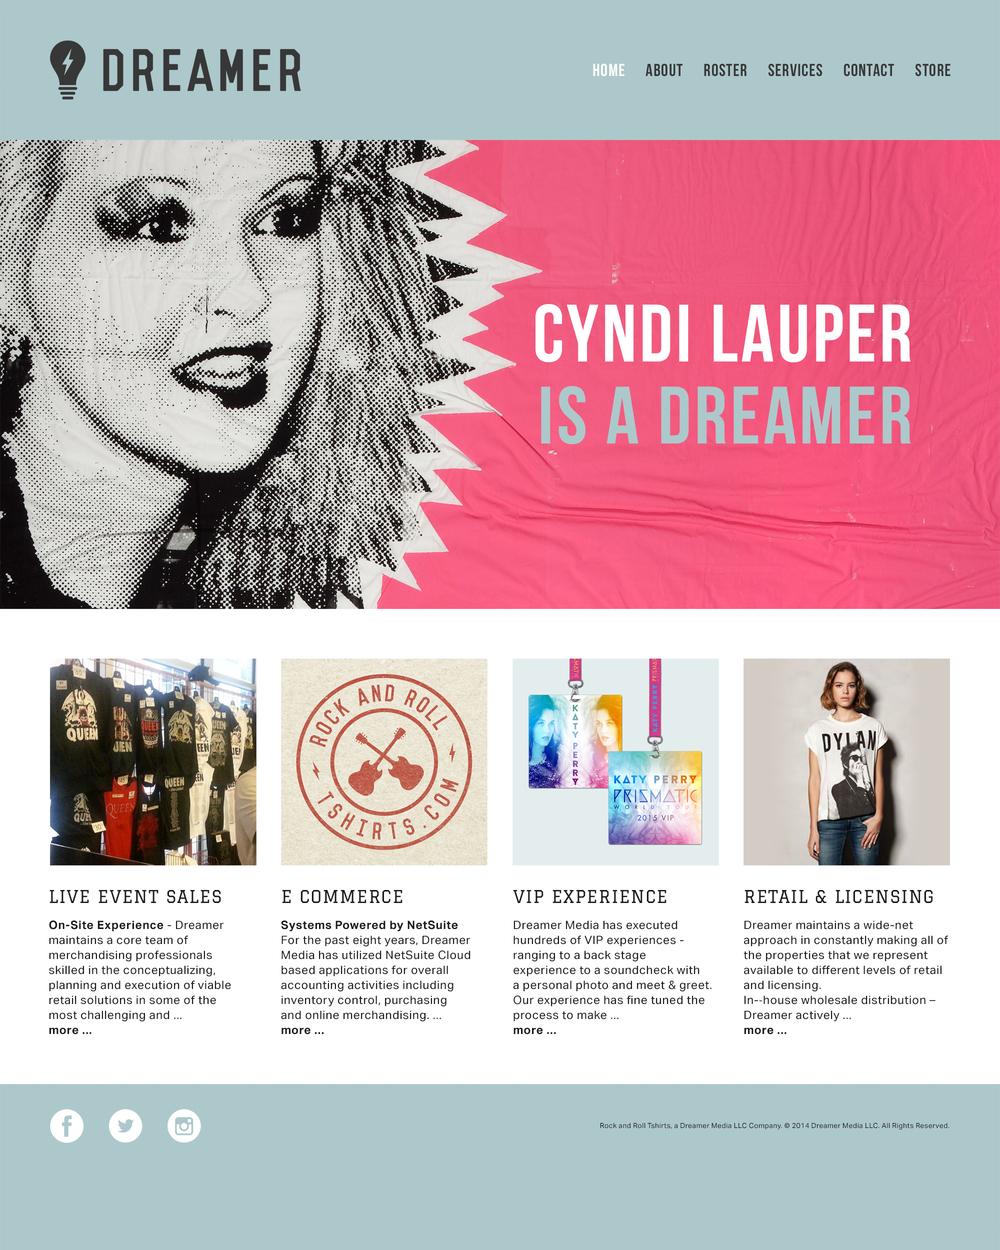 HEADER: CYNDI LAUPER